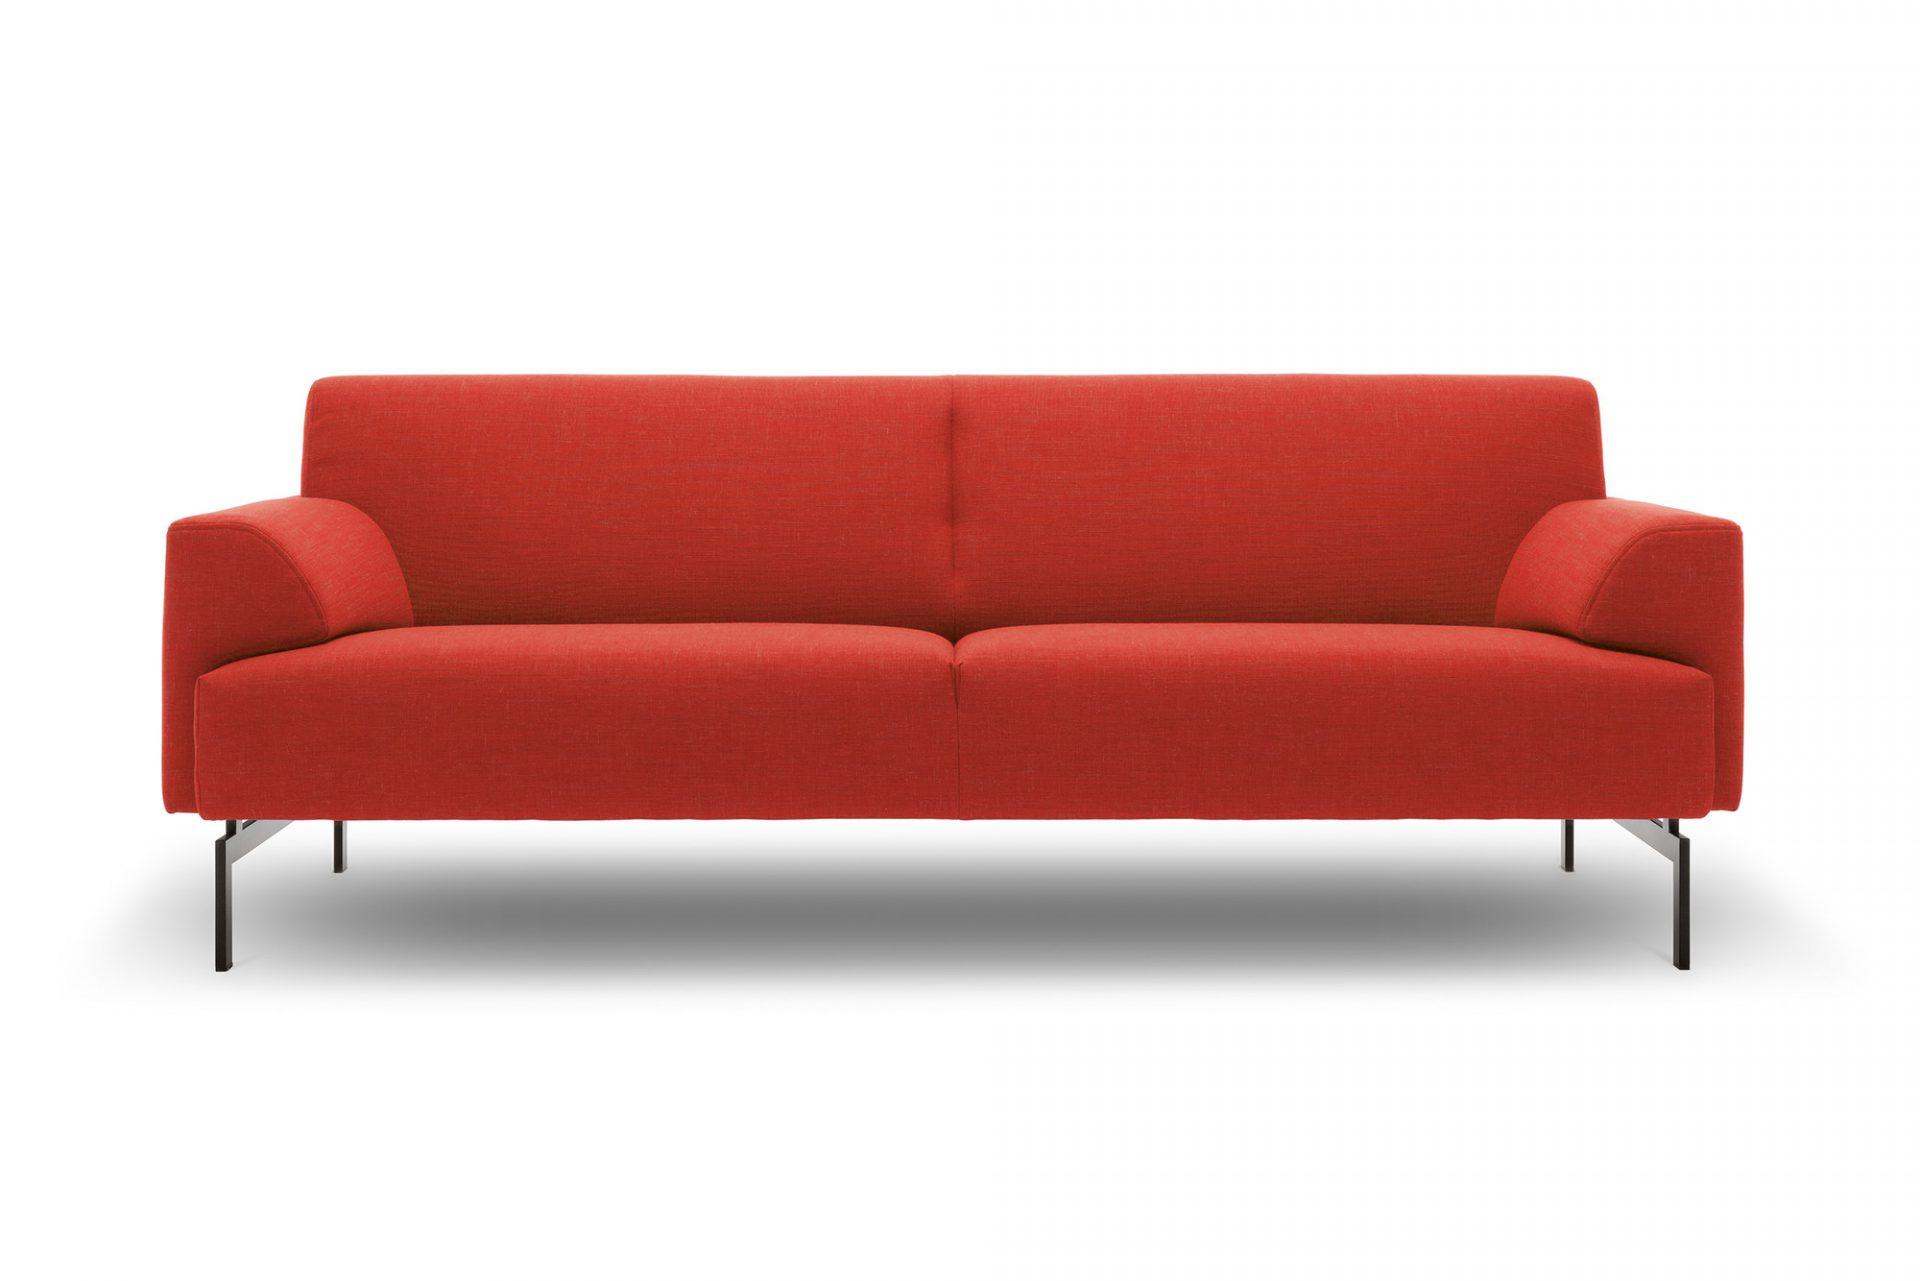 Rolf Benz 310 sofa